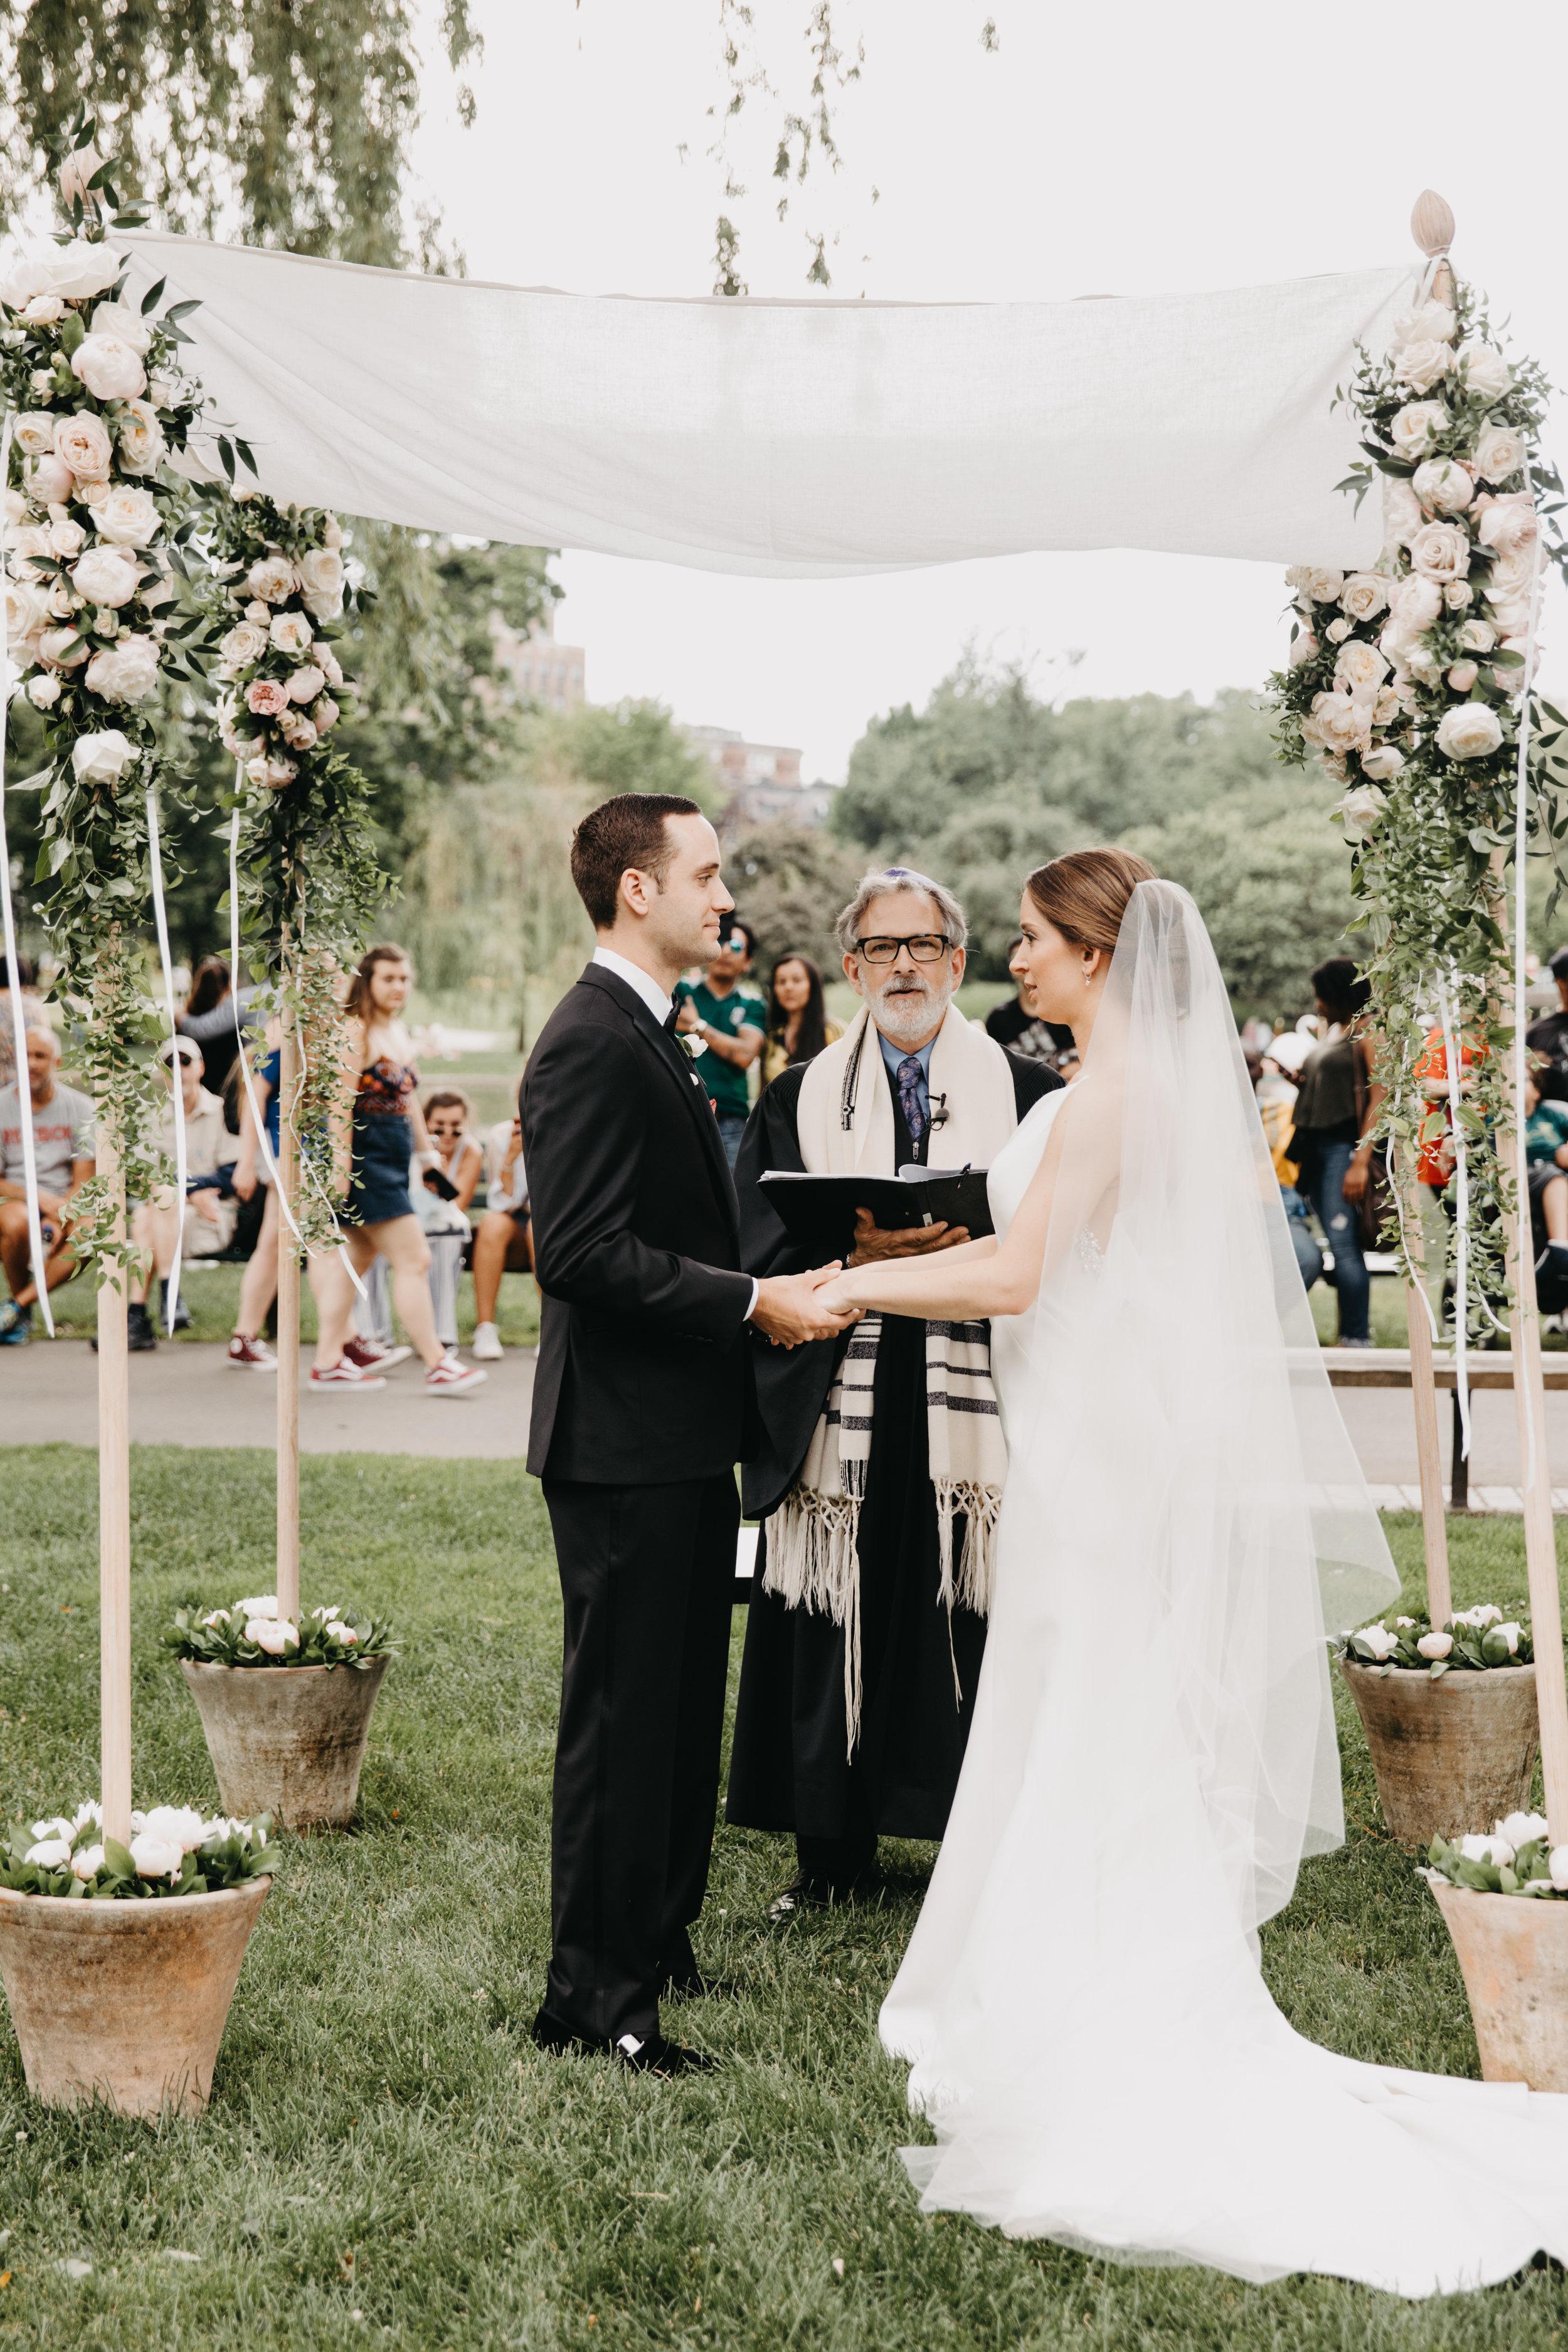 BOSTON PUBLIC GARDEN WEDDING, GARDEN WEDDING, BOSTON WEDDING PLANNER, NICOLE SIMERAL, FOUR SEASONS WEDDING, CLASSIC, TIMELESS, WEDDING WEDDING PLANNER, DESTINATION WEDDING, CHUPPAH